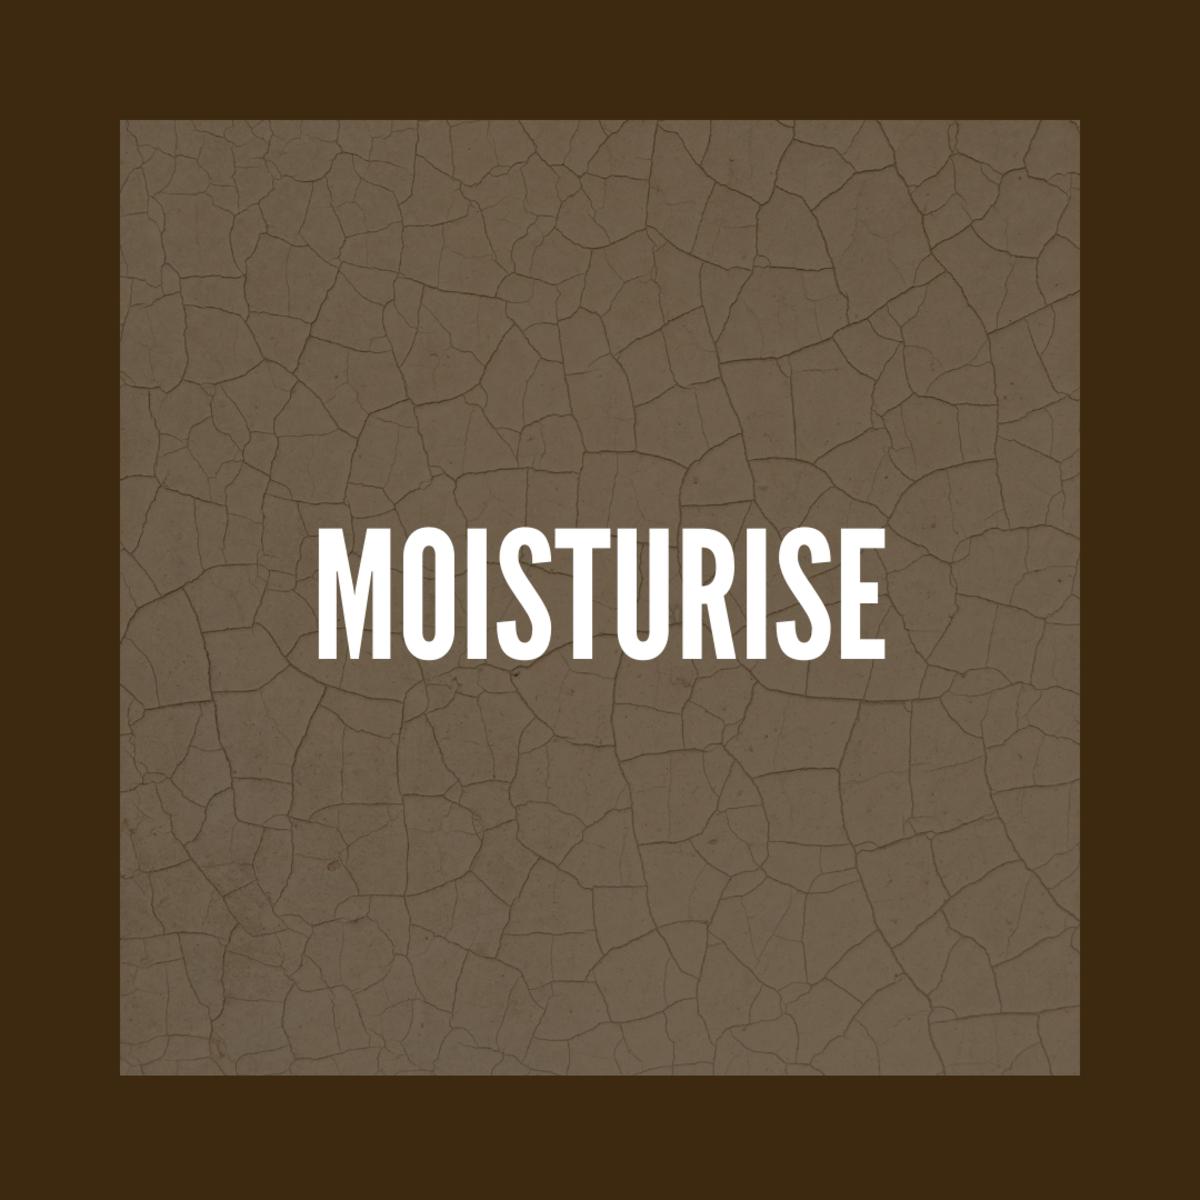 Use a good moisturiser.